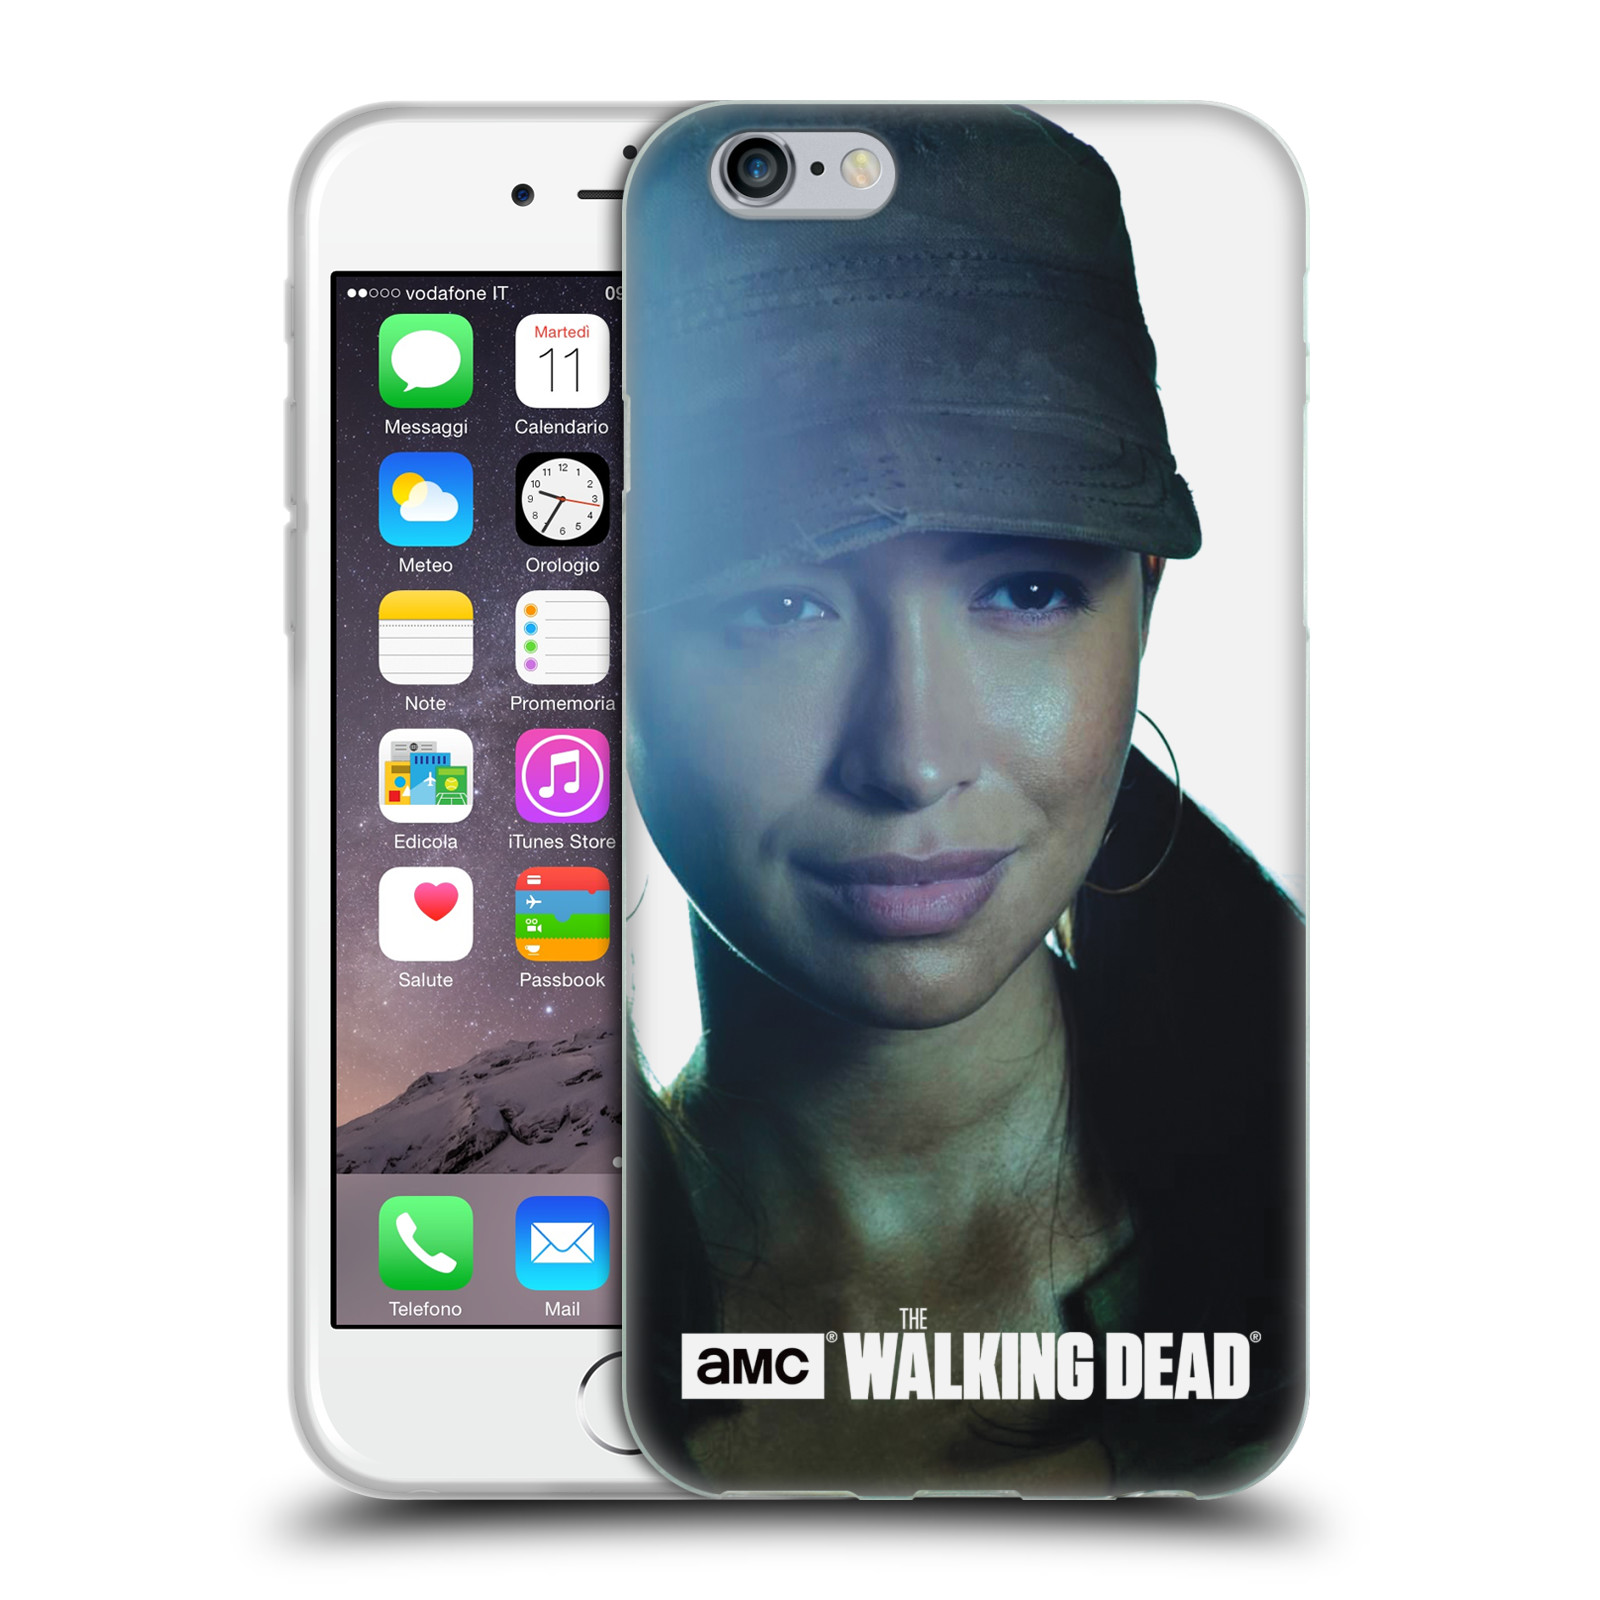 HEAD CASE silikonový obal na mobil Apple Iphone 6 / 6S originální potisk Walking Dead postavy Rosita